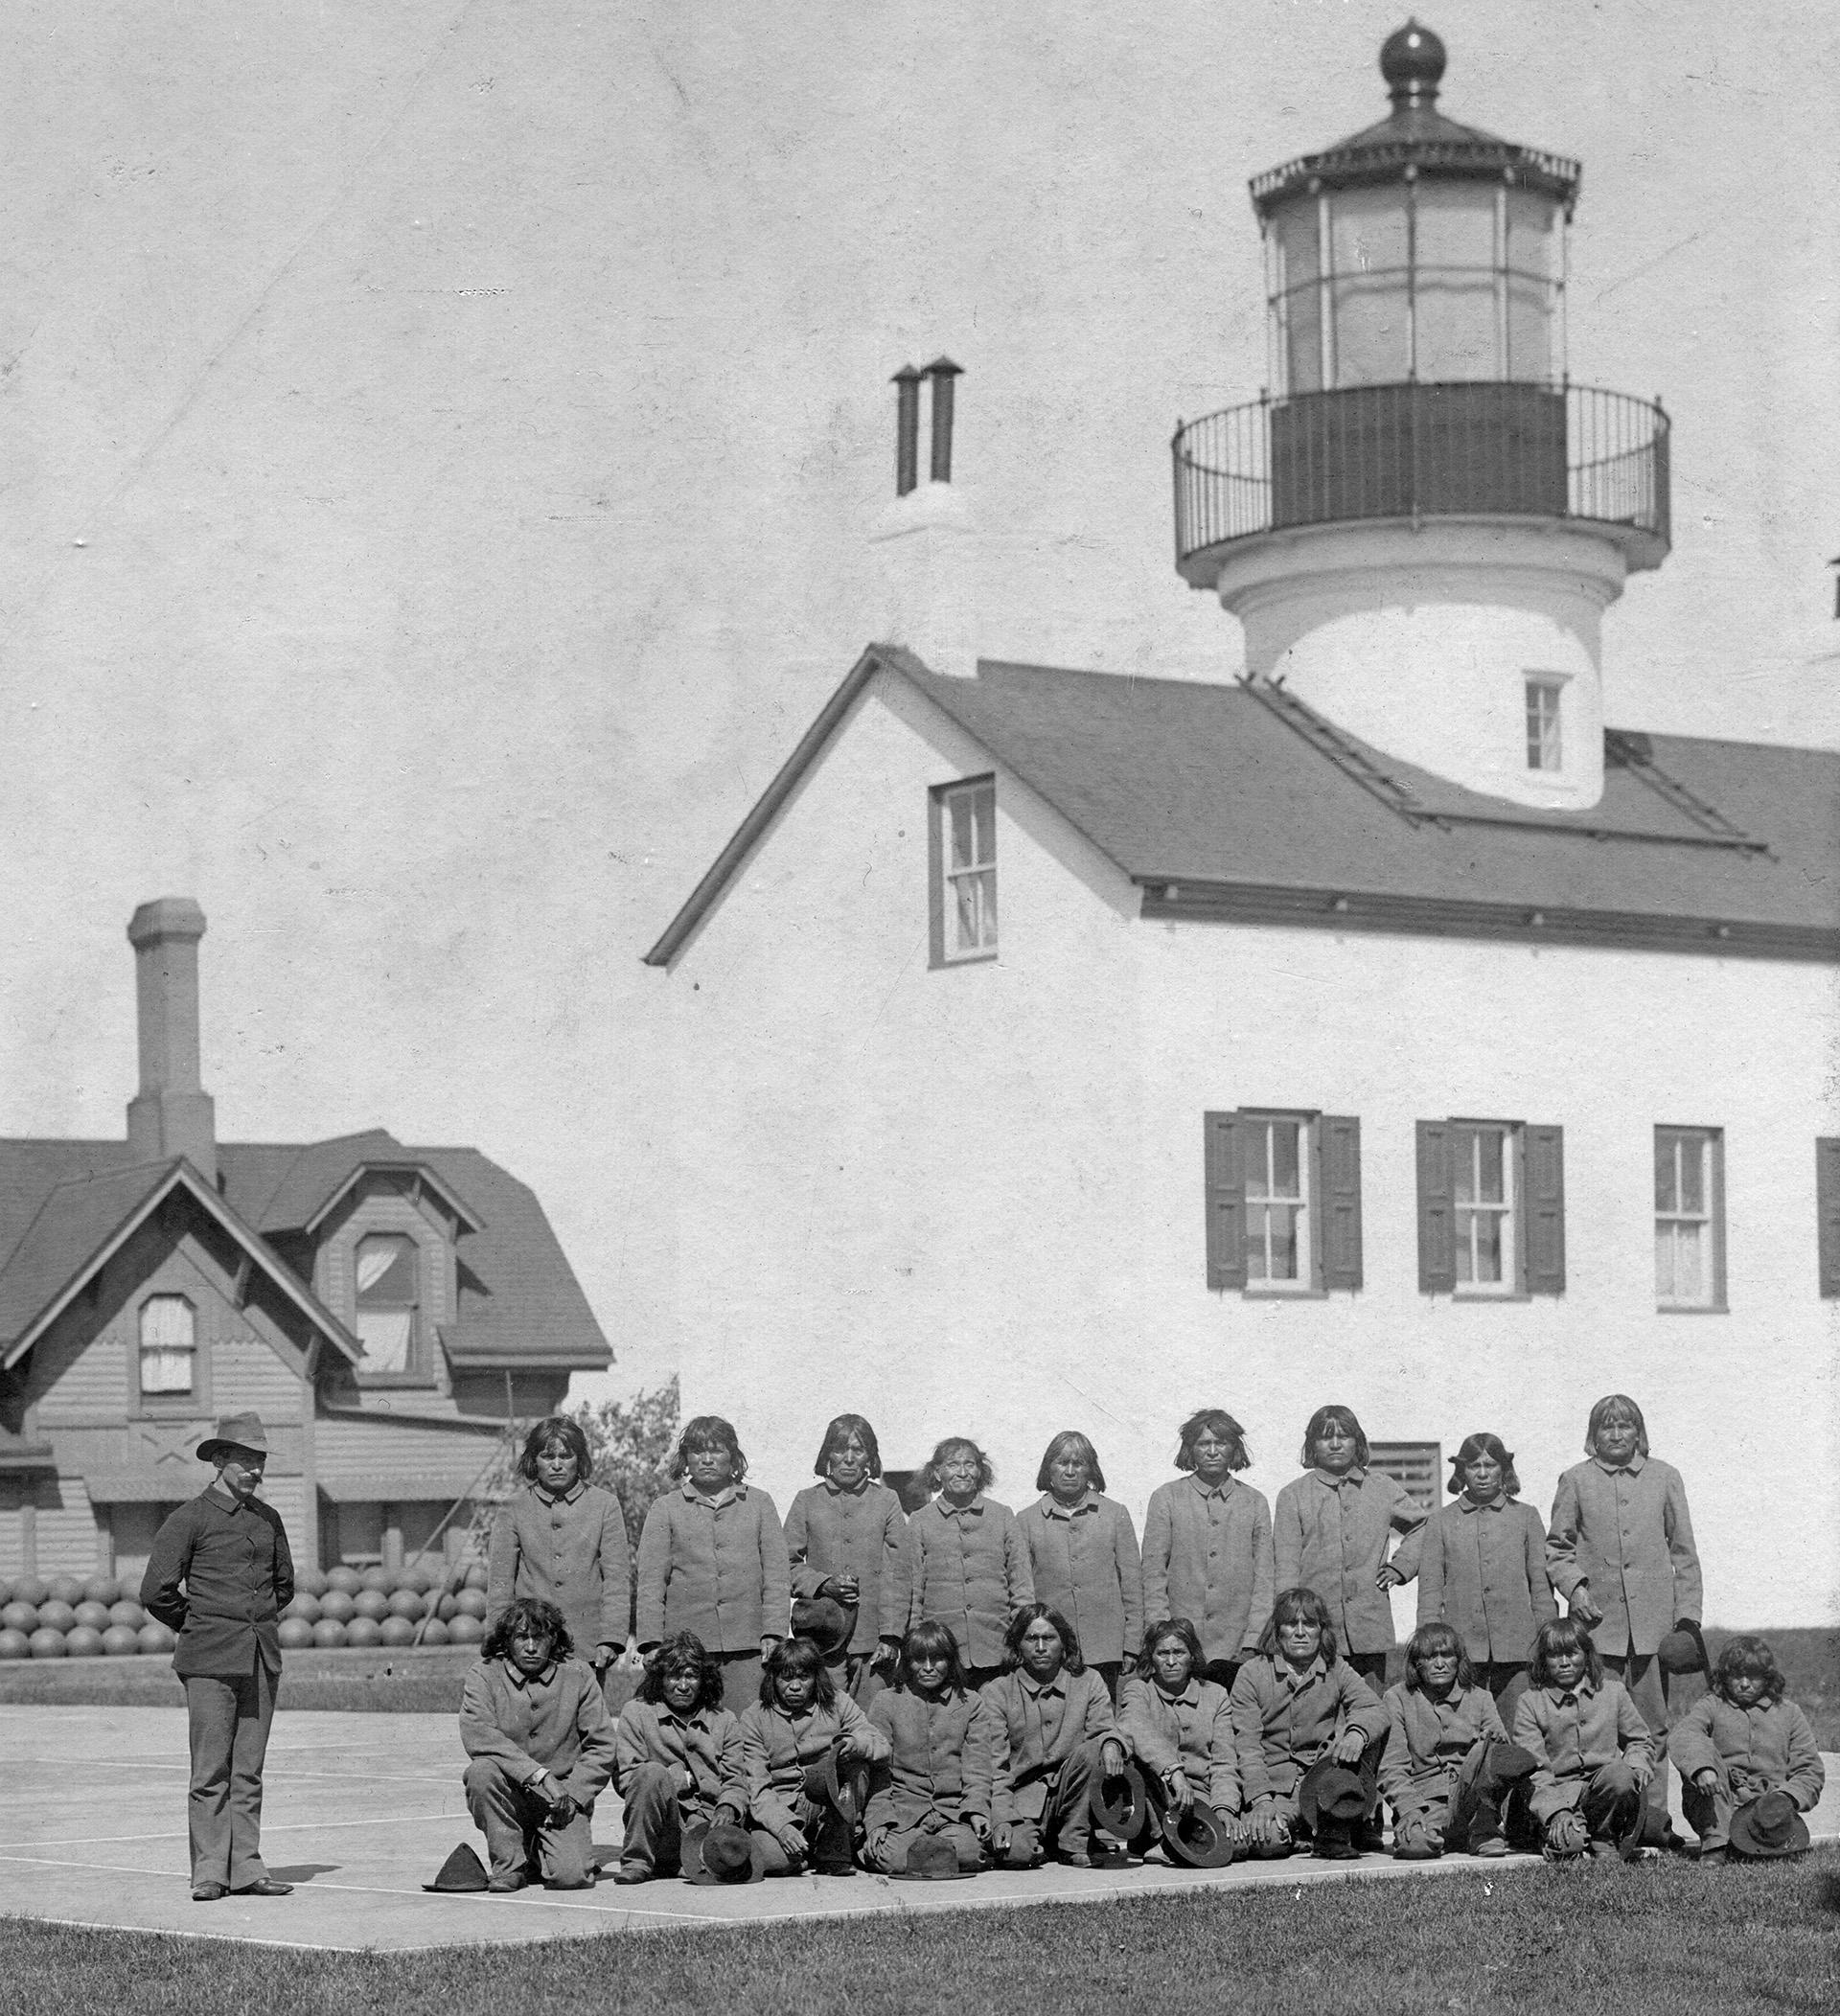 Hopi men from Oraibi, Arizona sent to Alcatraz, 1895. (Credit: Mennonite Library and Archives/Bethel College, North Newton, KS)